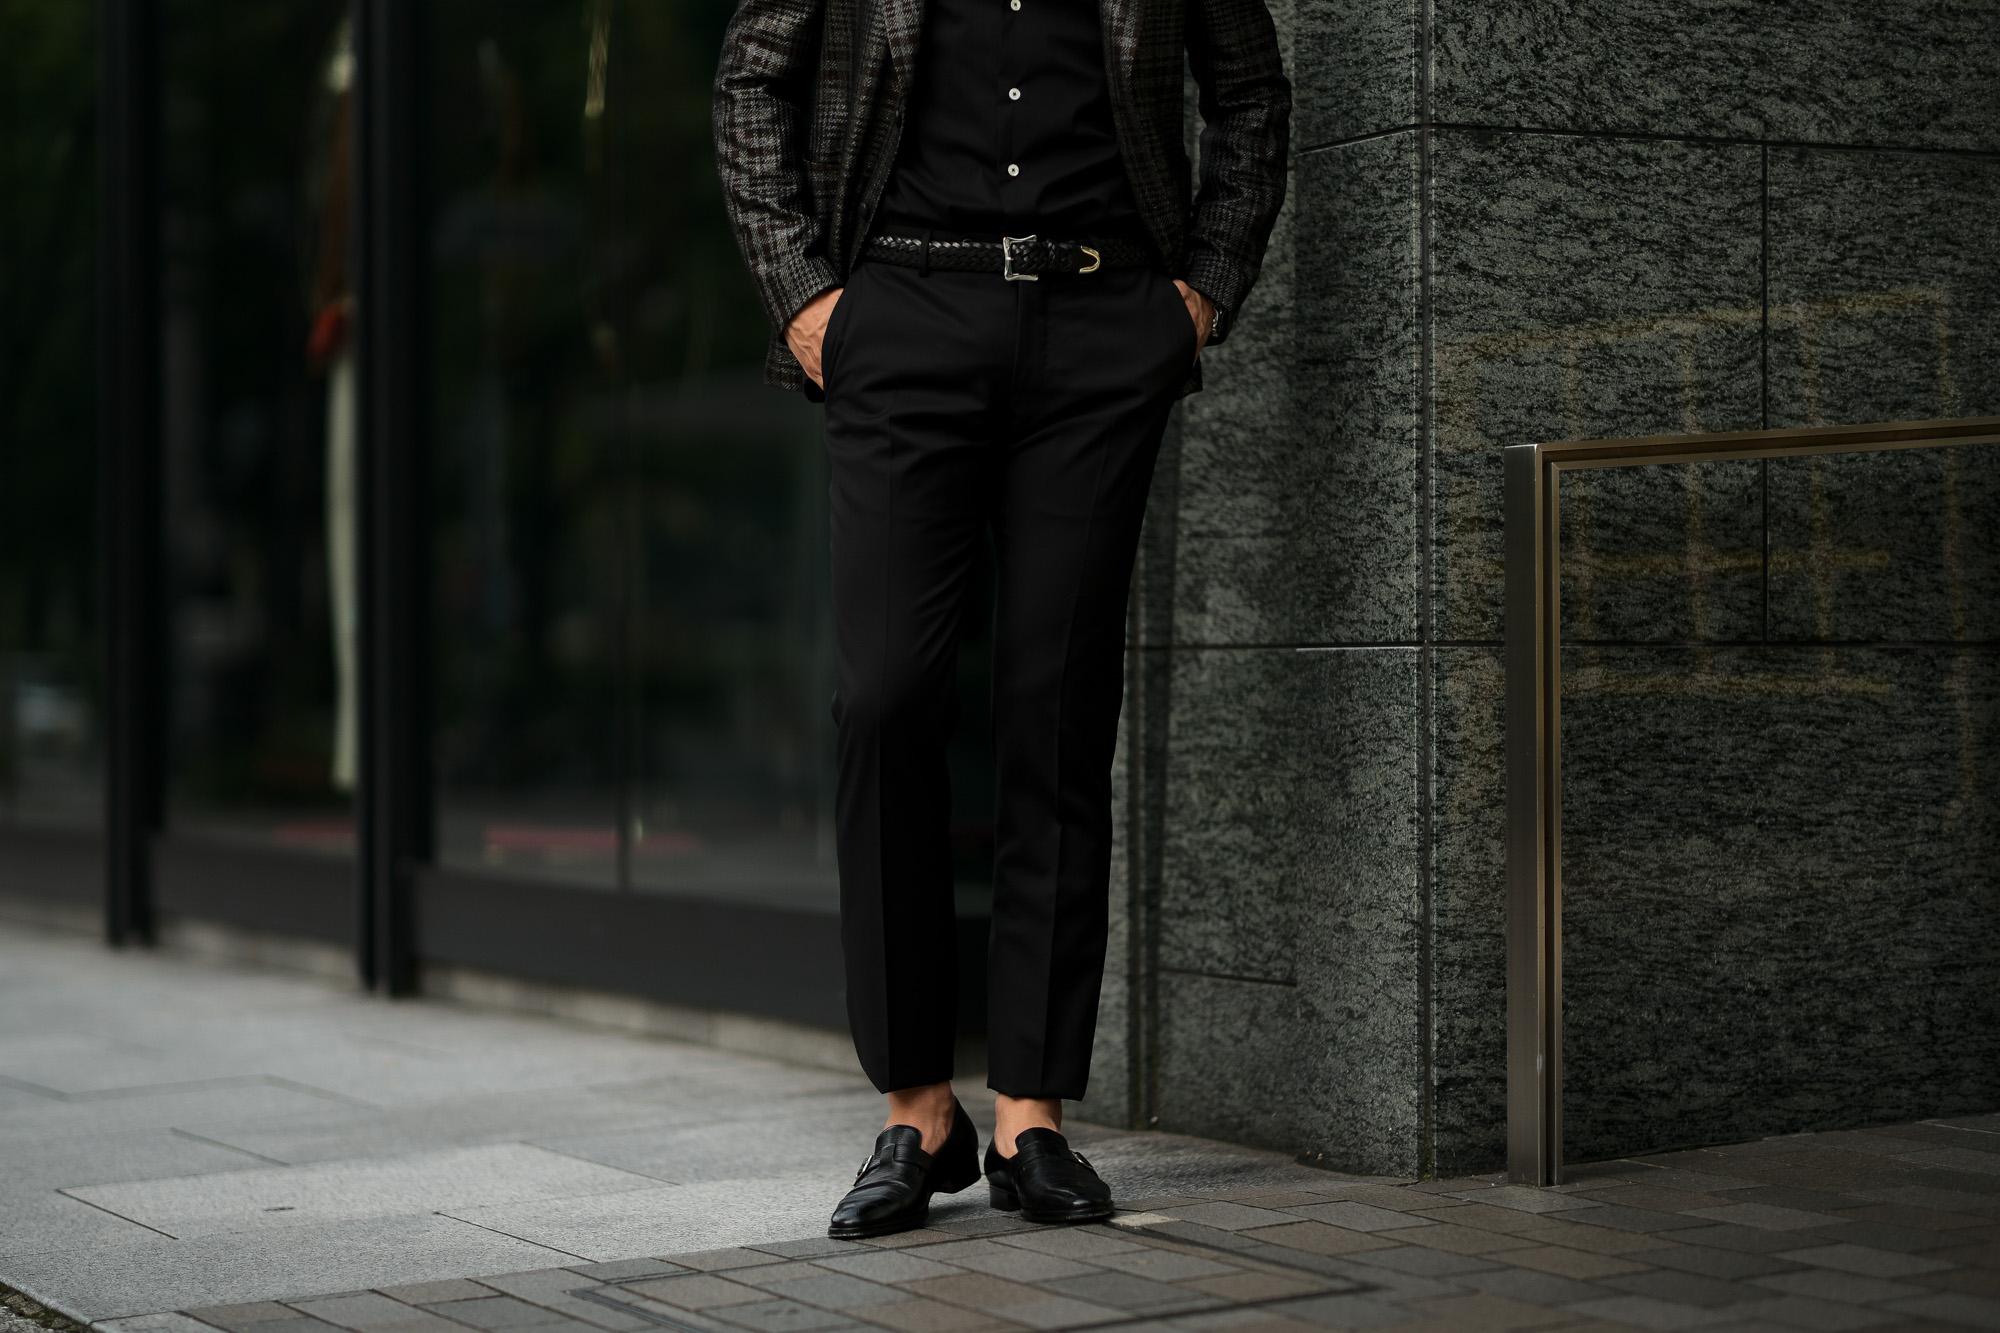 INCOTEX インコテックス N35 SLIM FIT SUPER 100'S WOOLLEN TWILL サージウール スラックス BLACK ブラック・990 2020 秋冬 【ご予約受付中】愛知 名古屋 altoediritto アルトエデリット